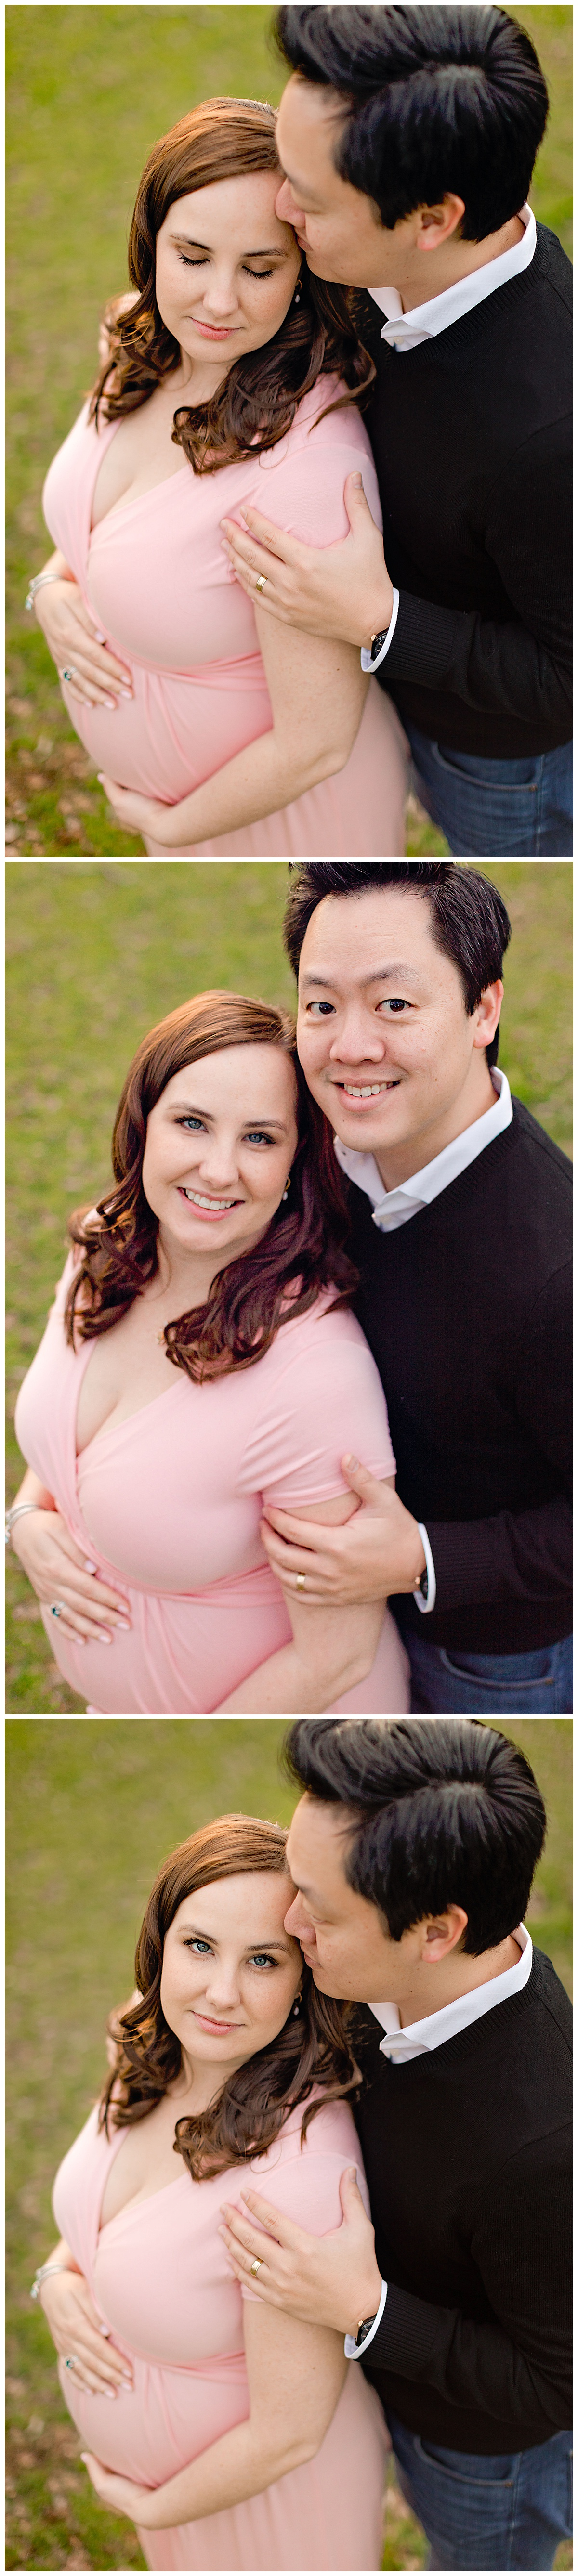 Maternity-Photographer-Texas-Carly-Barton-Photography-LaVernia-Photos_0004.jpg